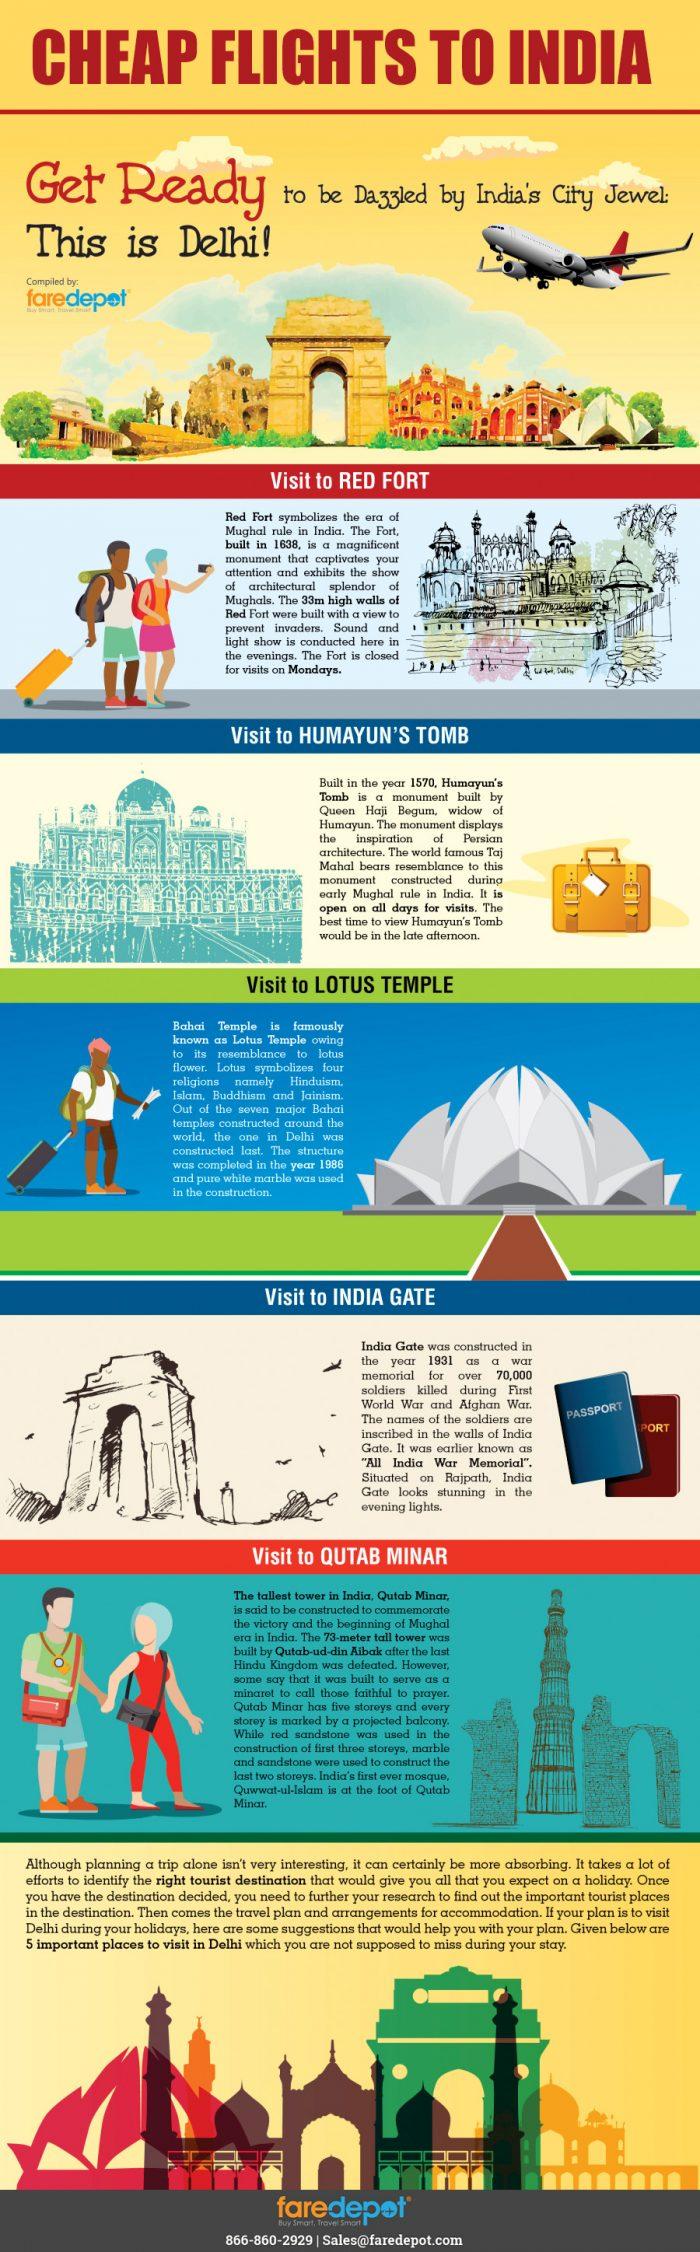 Cheap Flights to India